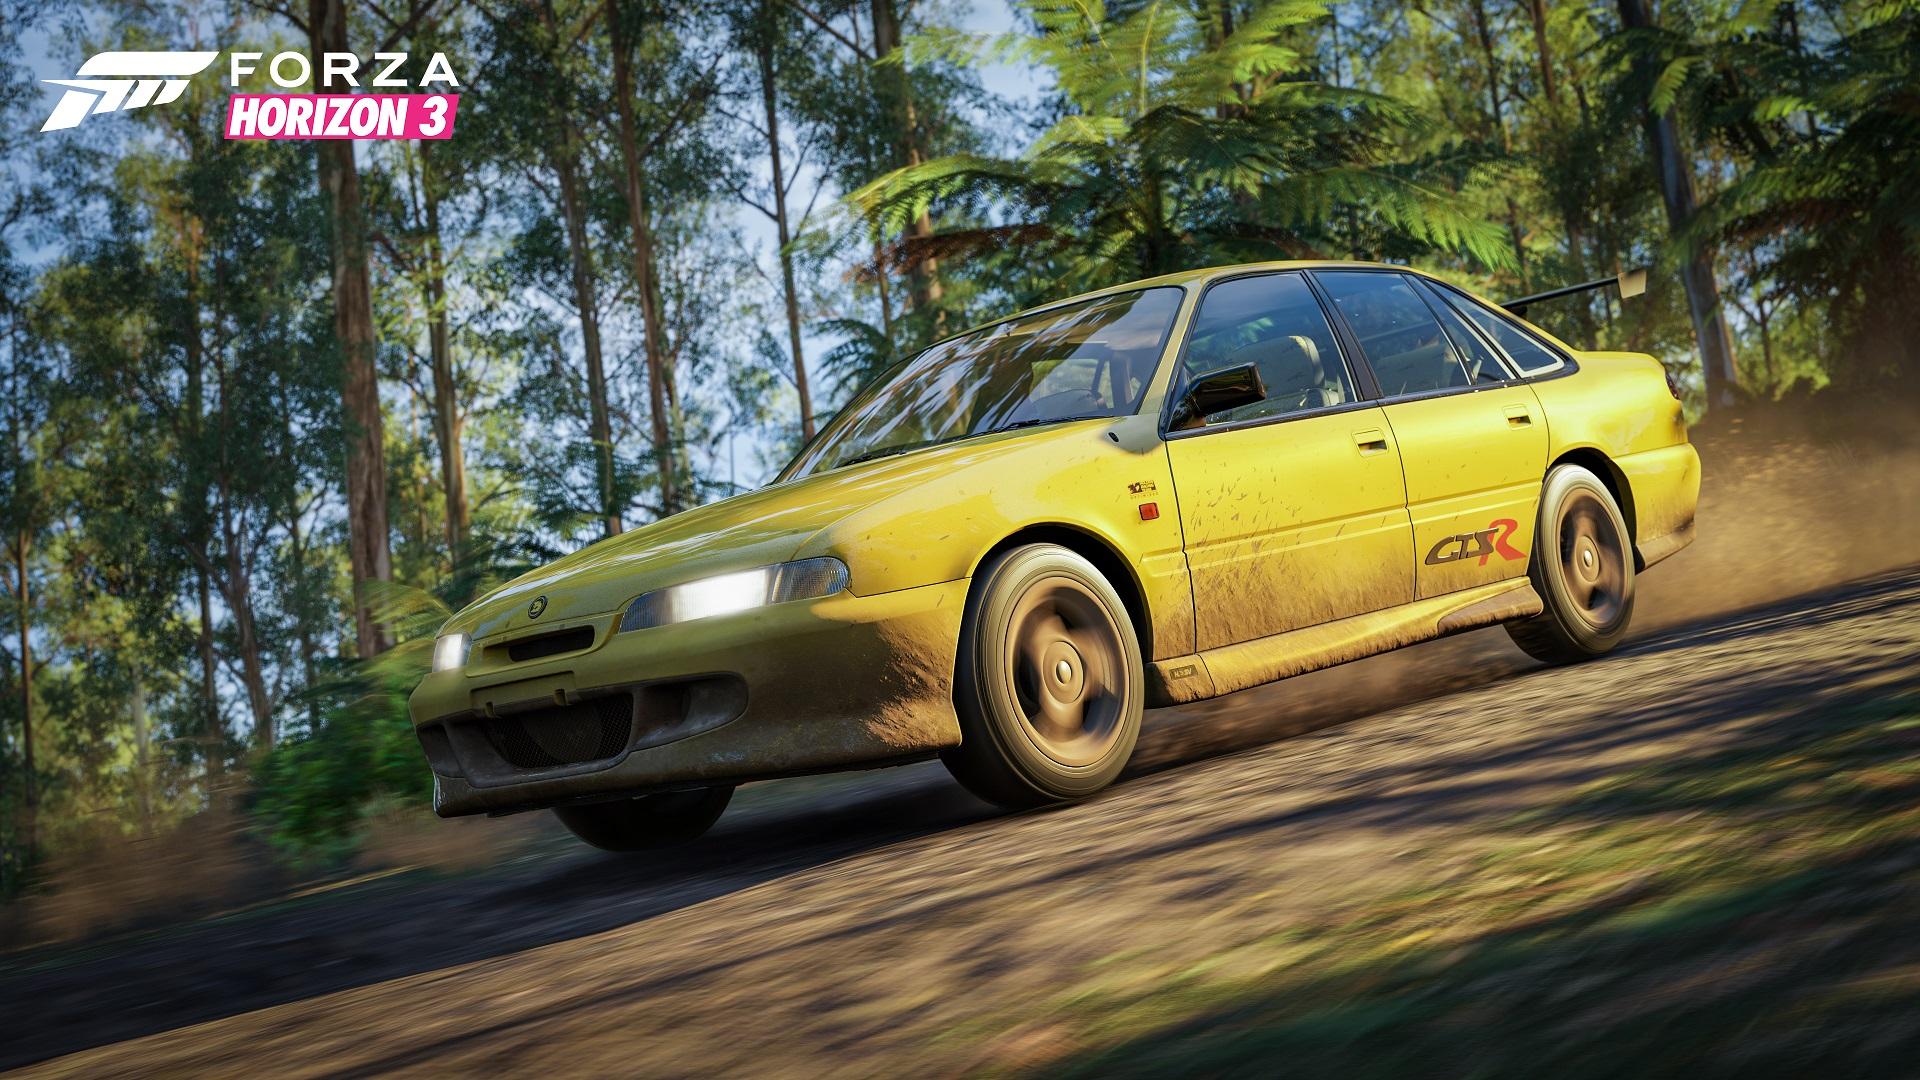 HSV GTSR | Forza Motorsport Wiki | FANDOM powered by Wikia